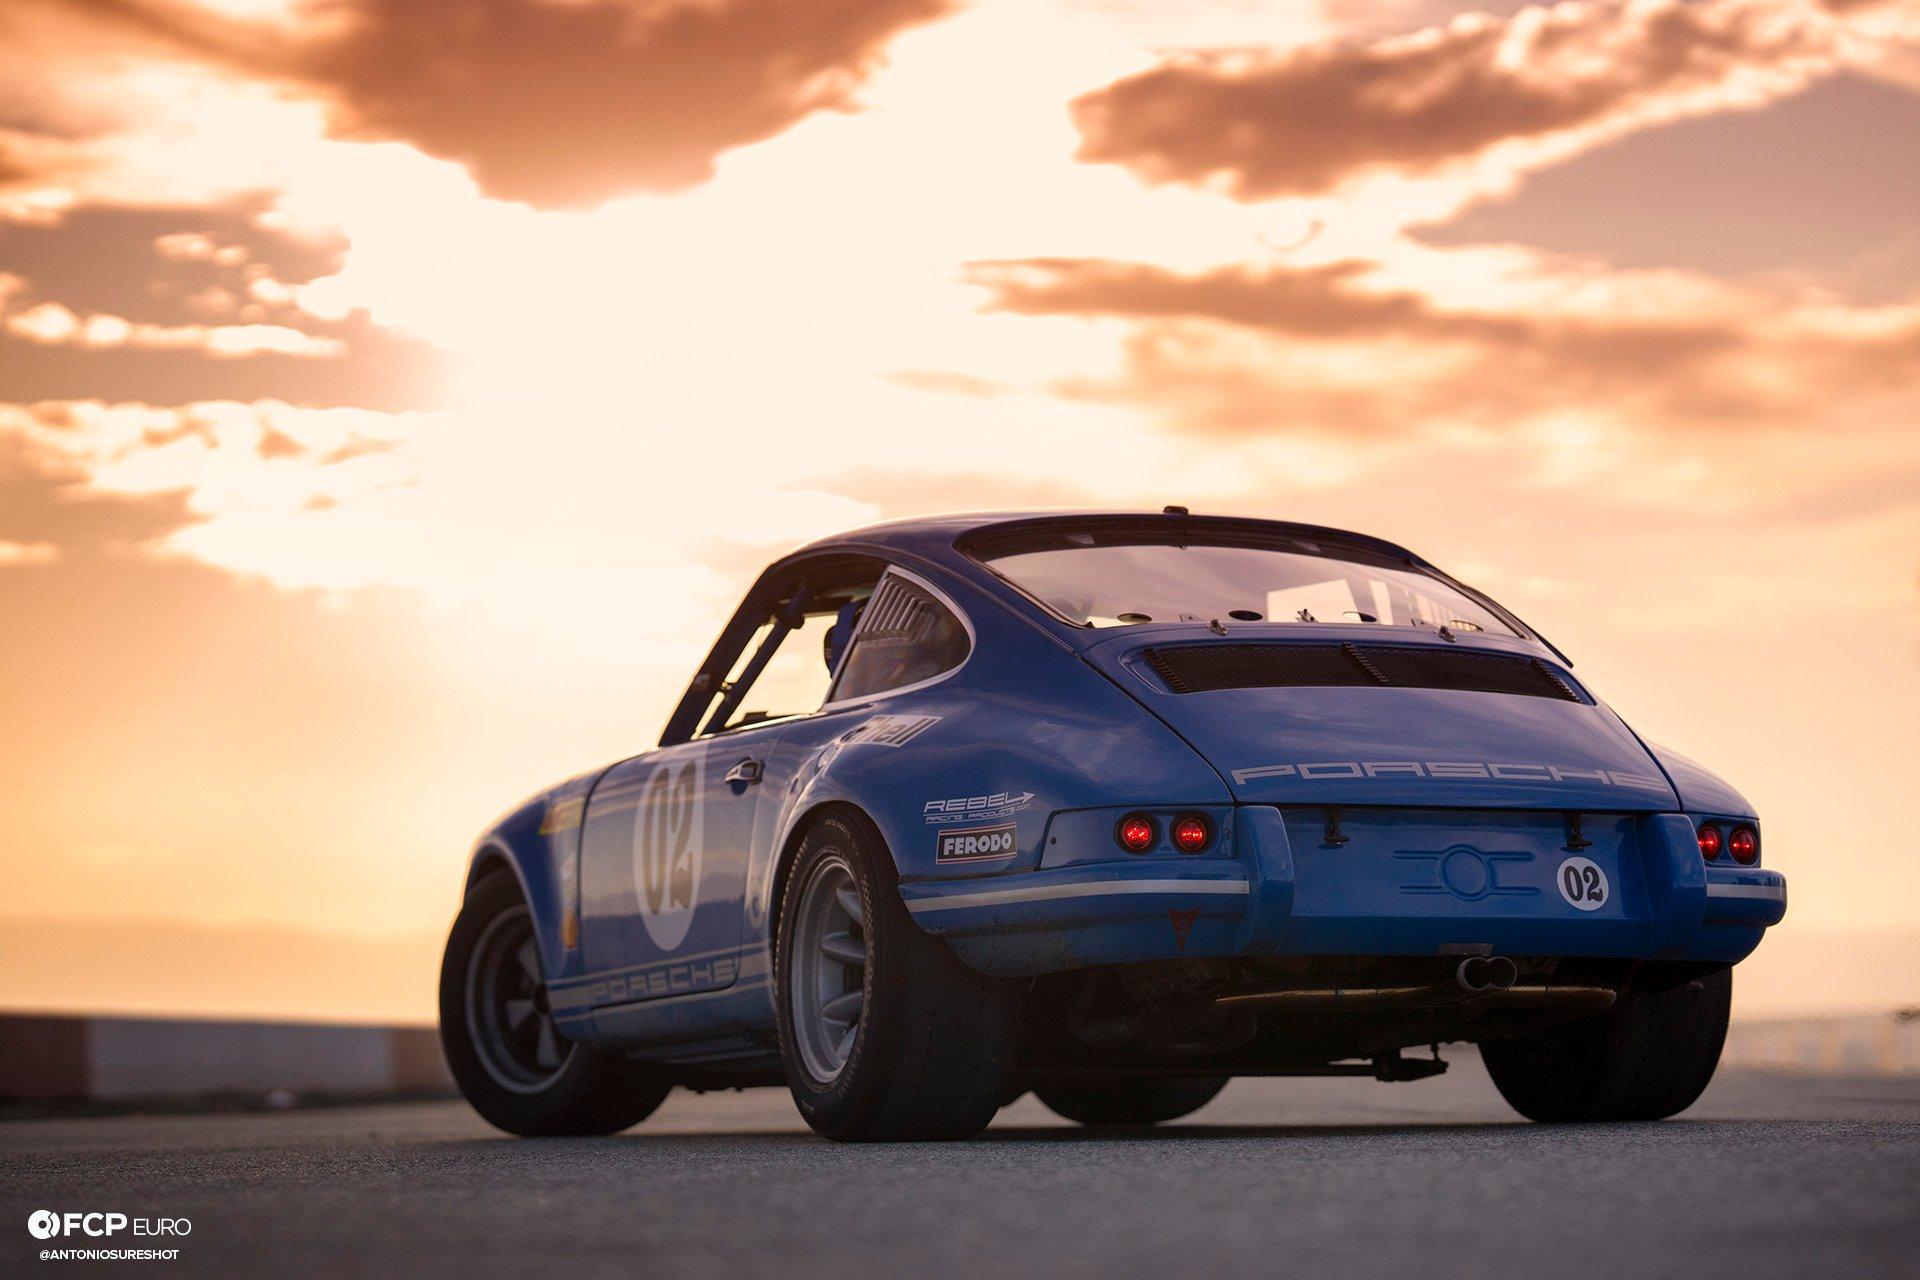 Porsche 911 Longnose VARA Patrick Long Chad Plavan EOSR9378